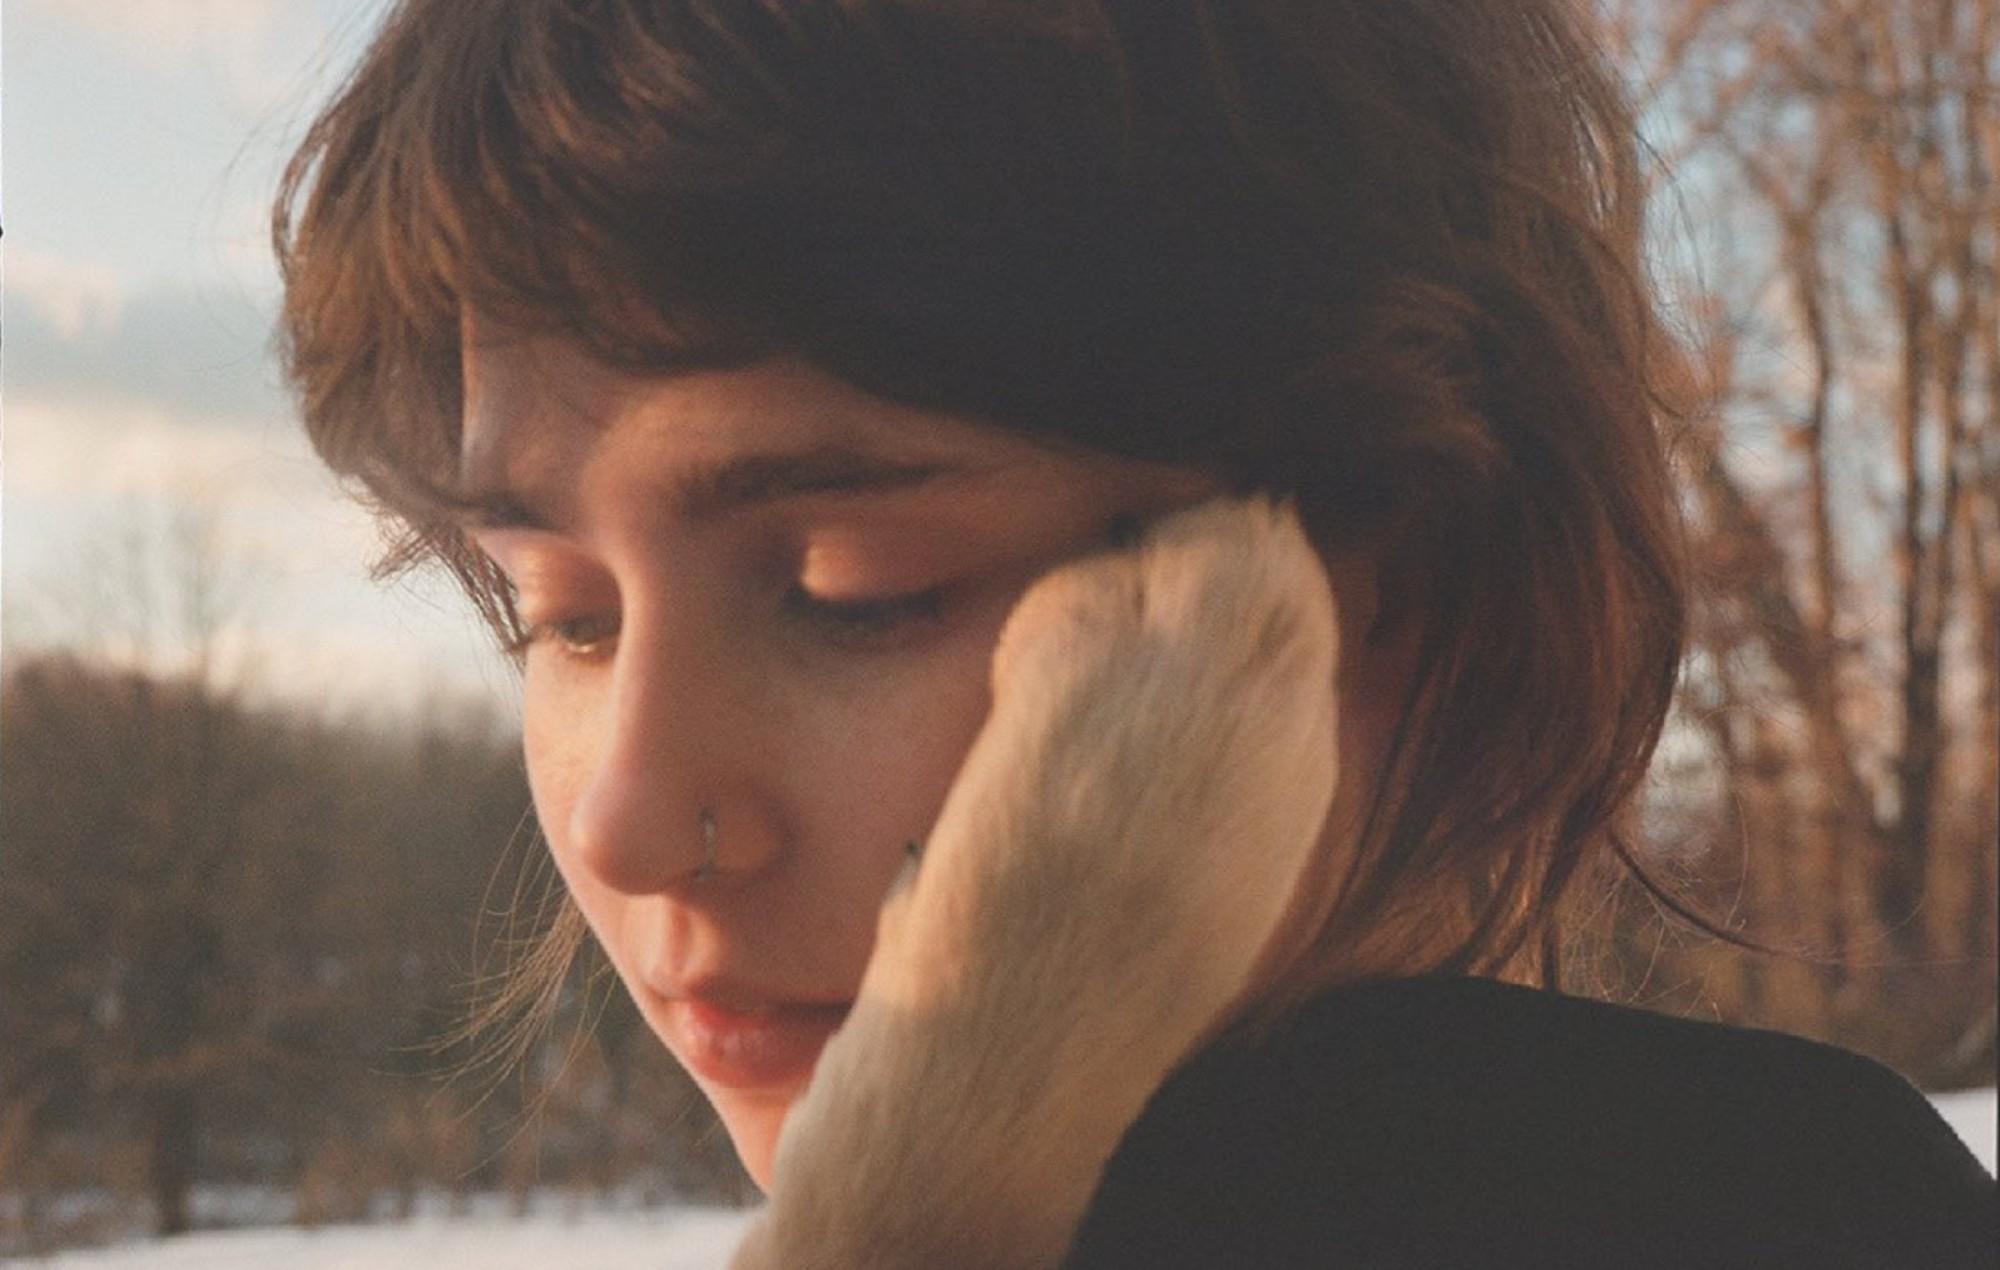 clairo sling blouse new album